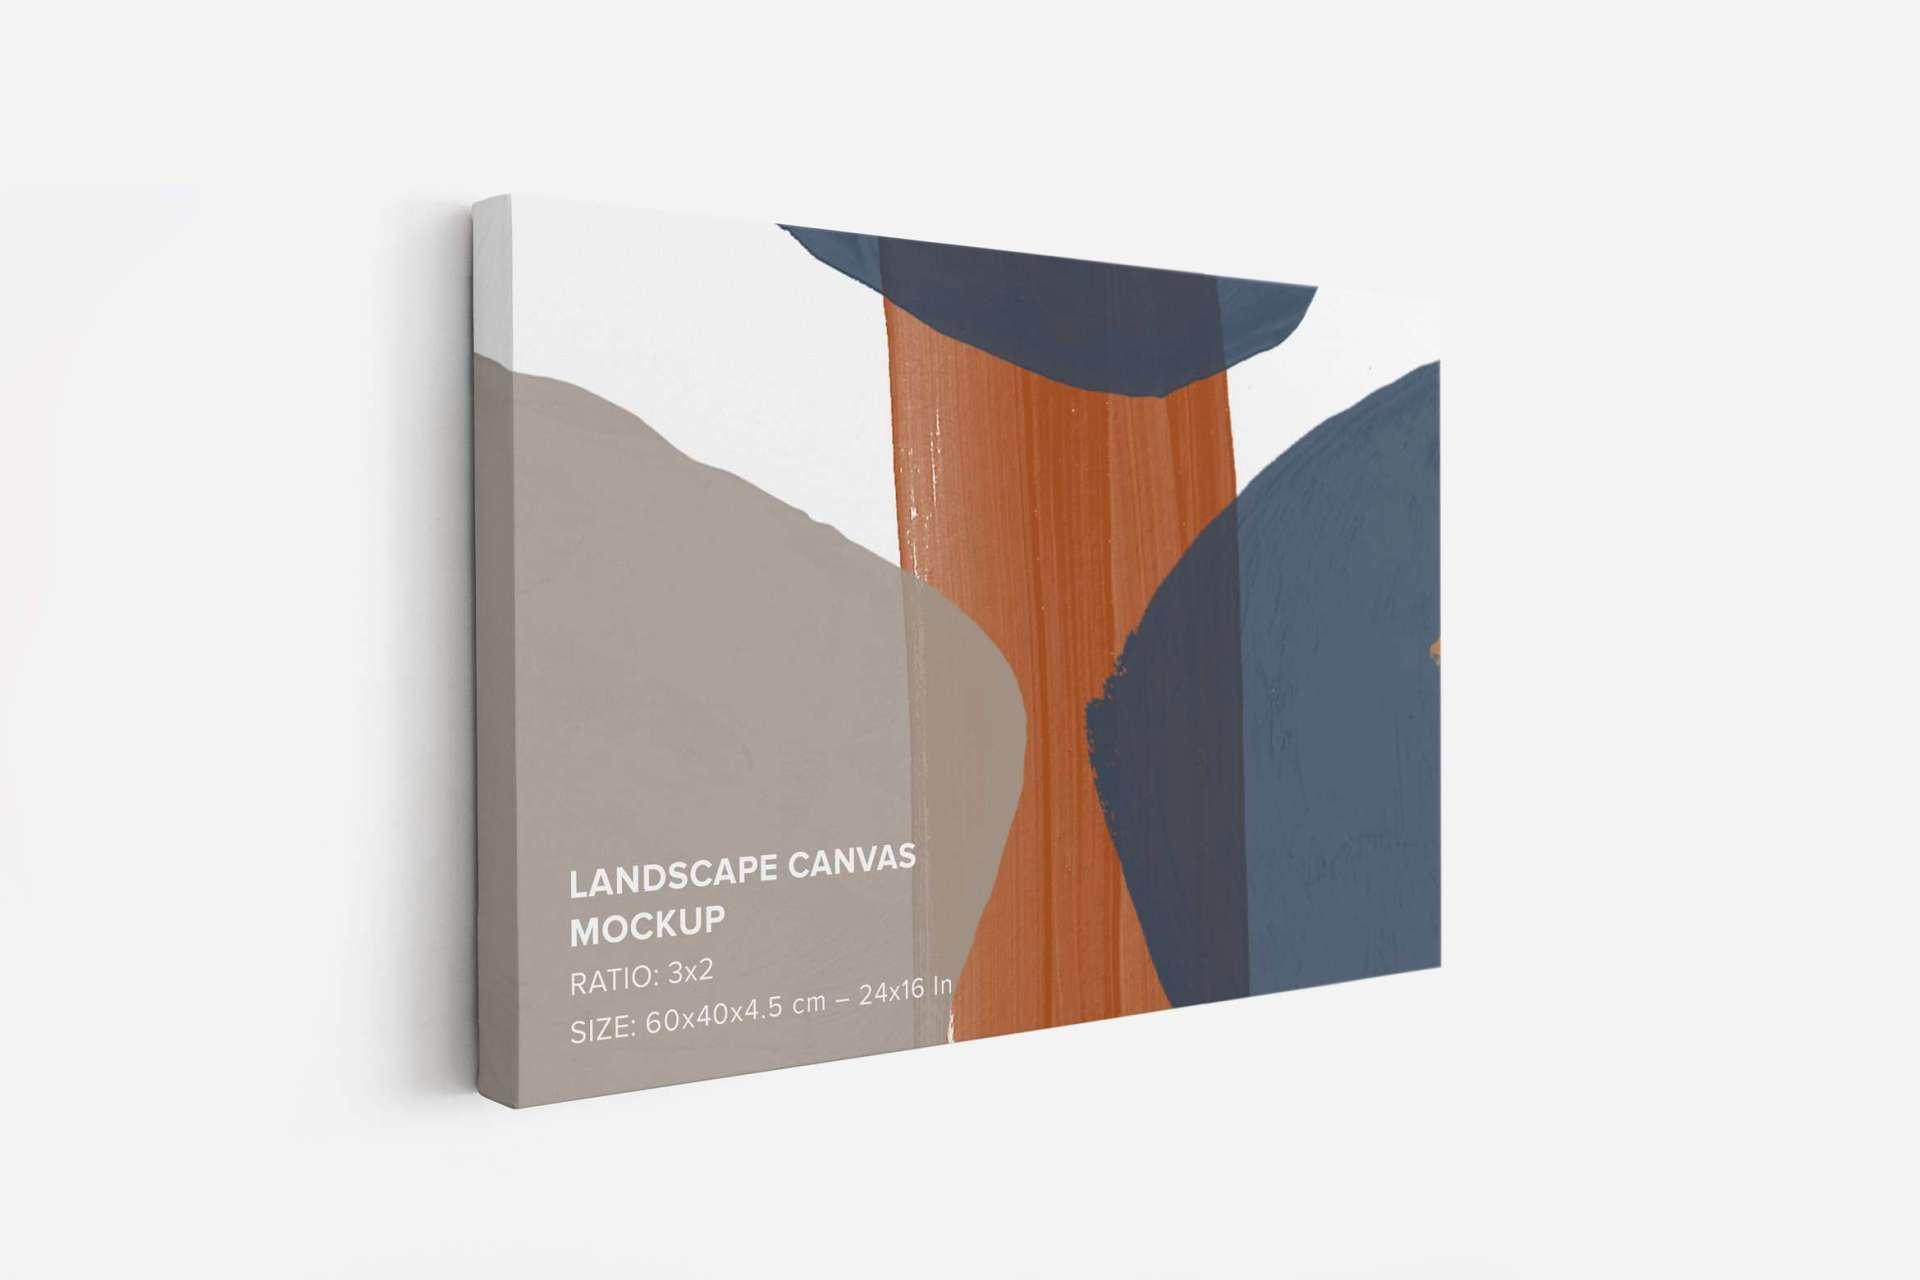 Landscape Canvas Ratio 3x2 Mockup Set